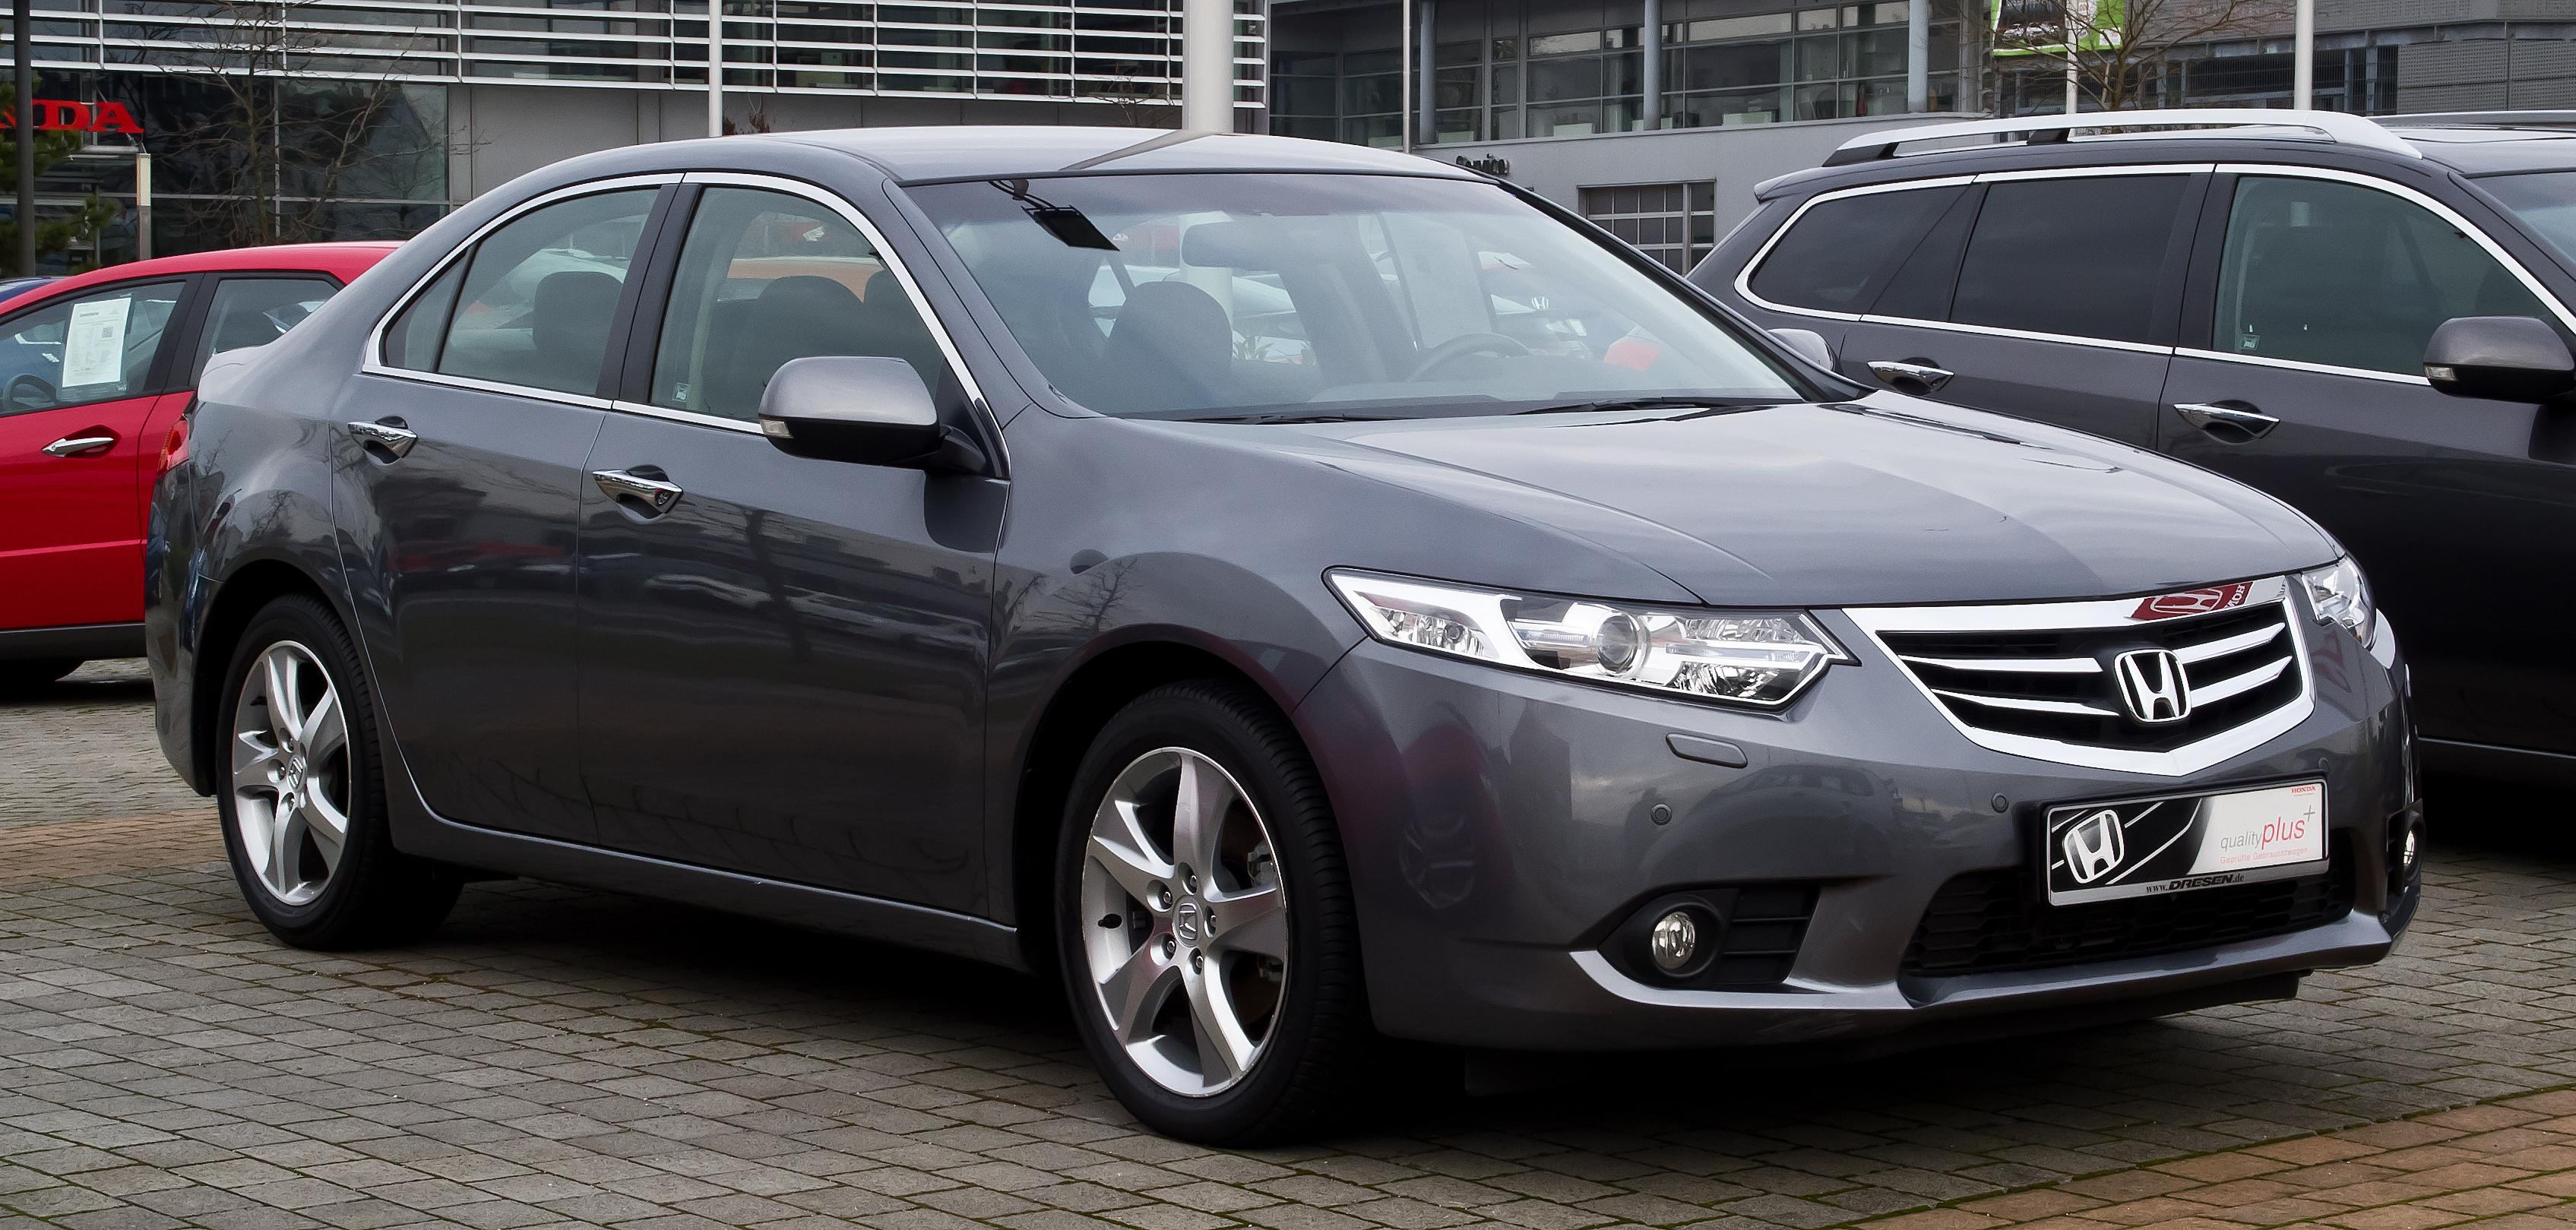 Honda Accord VIII 2.4i Automatic (201 Hp)